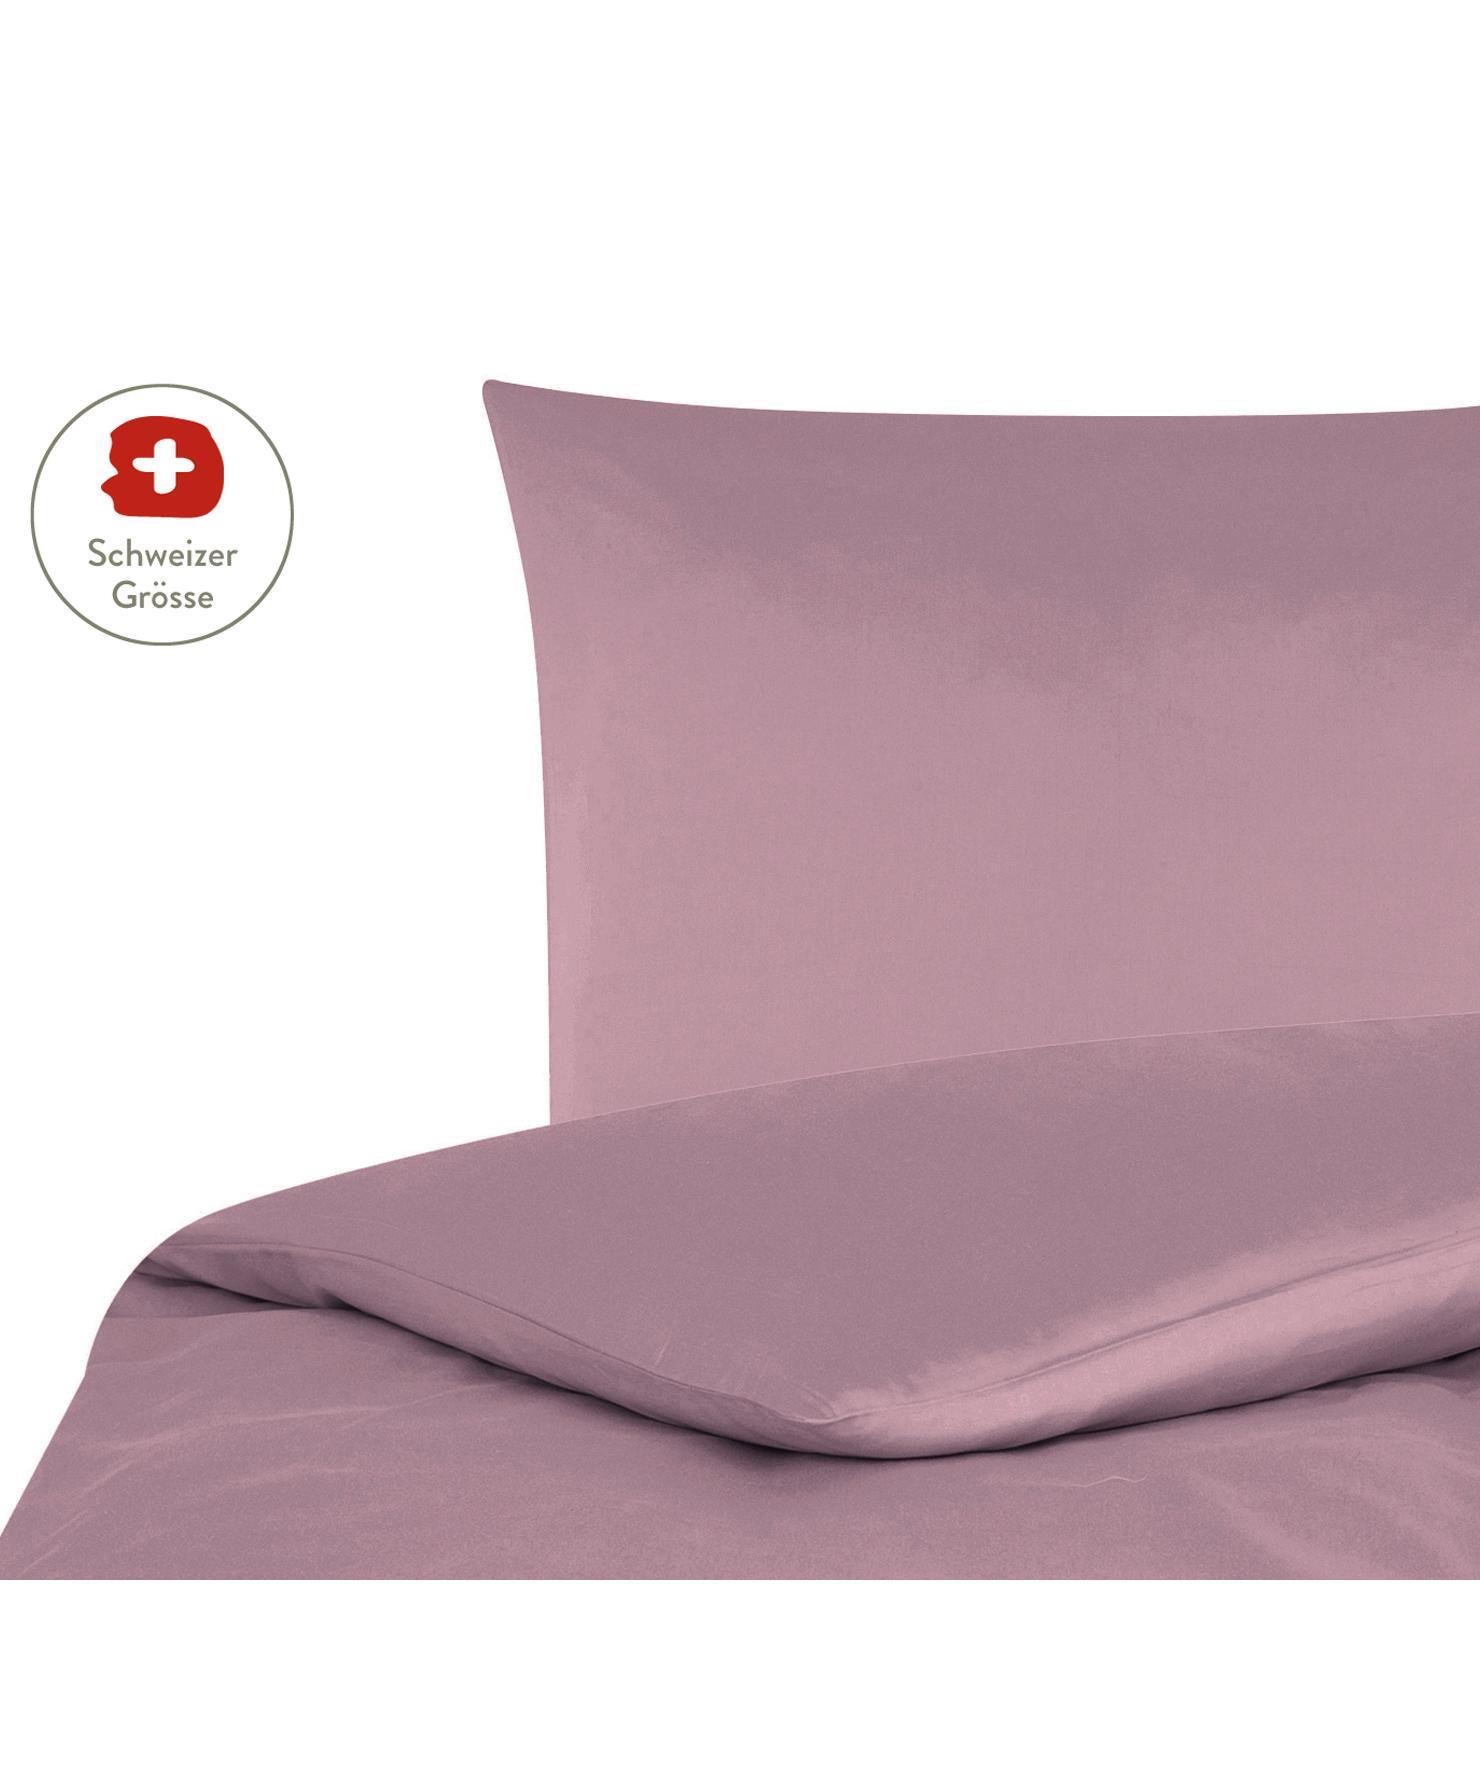 Baumwollsatin-Bettdeckenbezug Comfort in Mauve, Webart: Satin, leicht glänzend Fa, Mauve, 160 x 210 cm